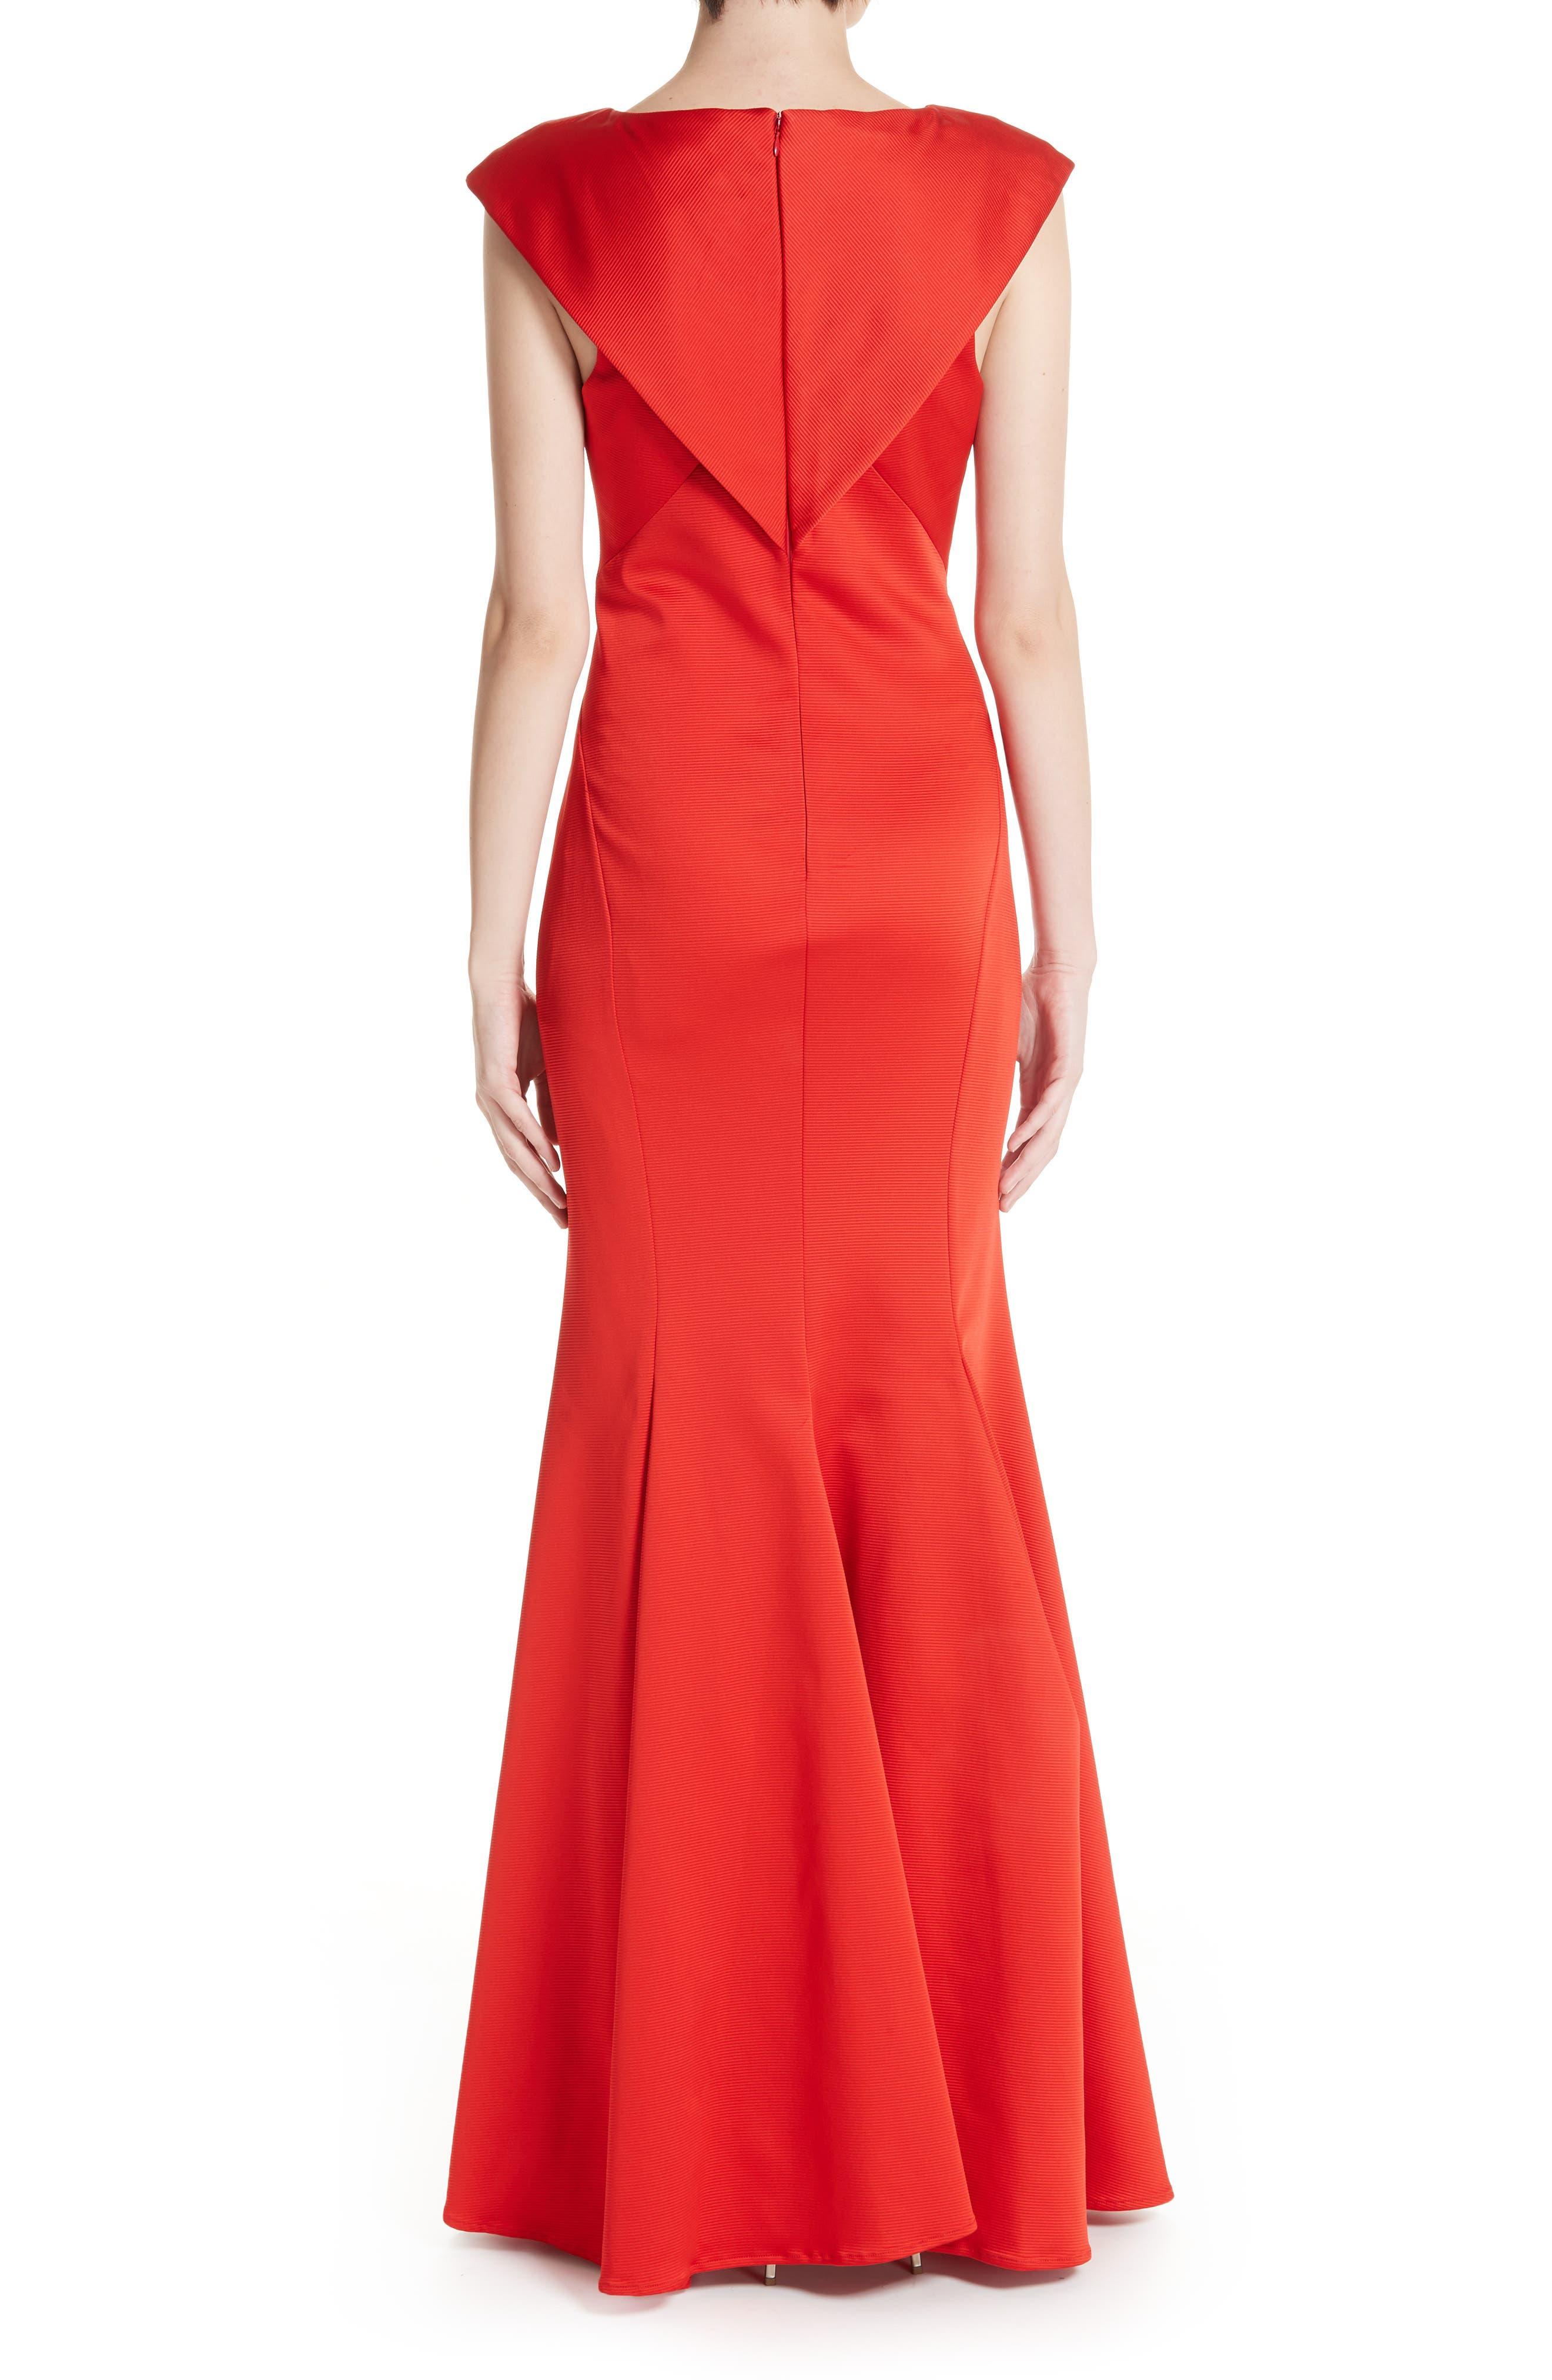 ZAC ZAC POSEN, Nina Trumpet Gown, Alternate thumbnail 2, color, RED